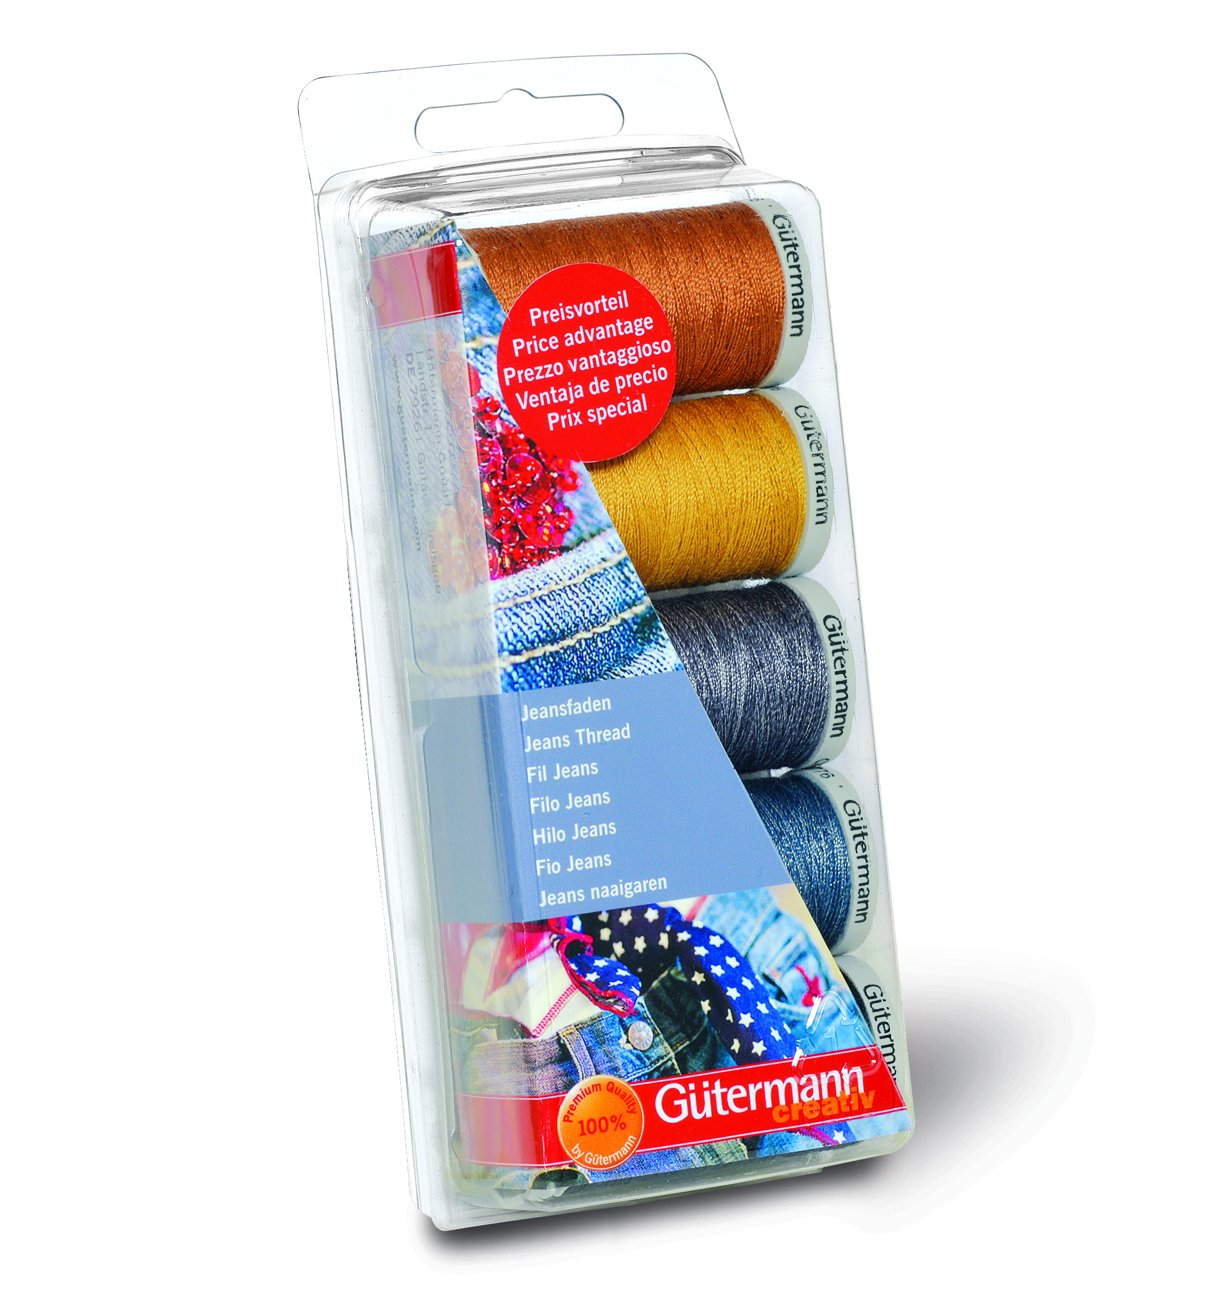 Gutermann Jeans - Juego de hilos de costura, 5 bobinas, tonos vaqueros product image